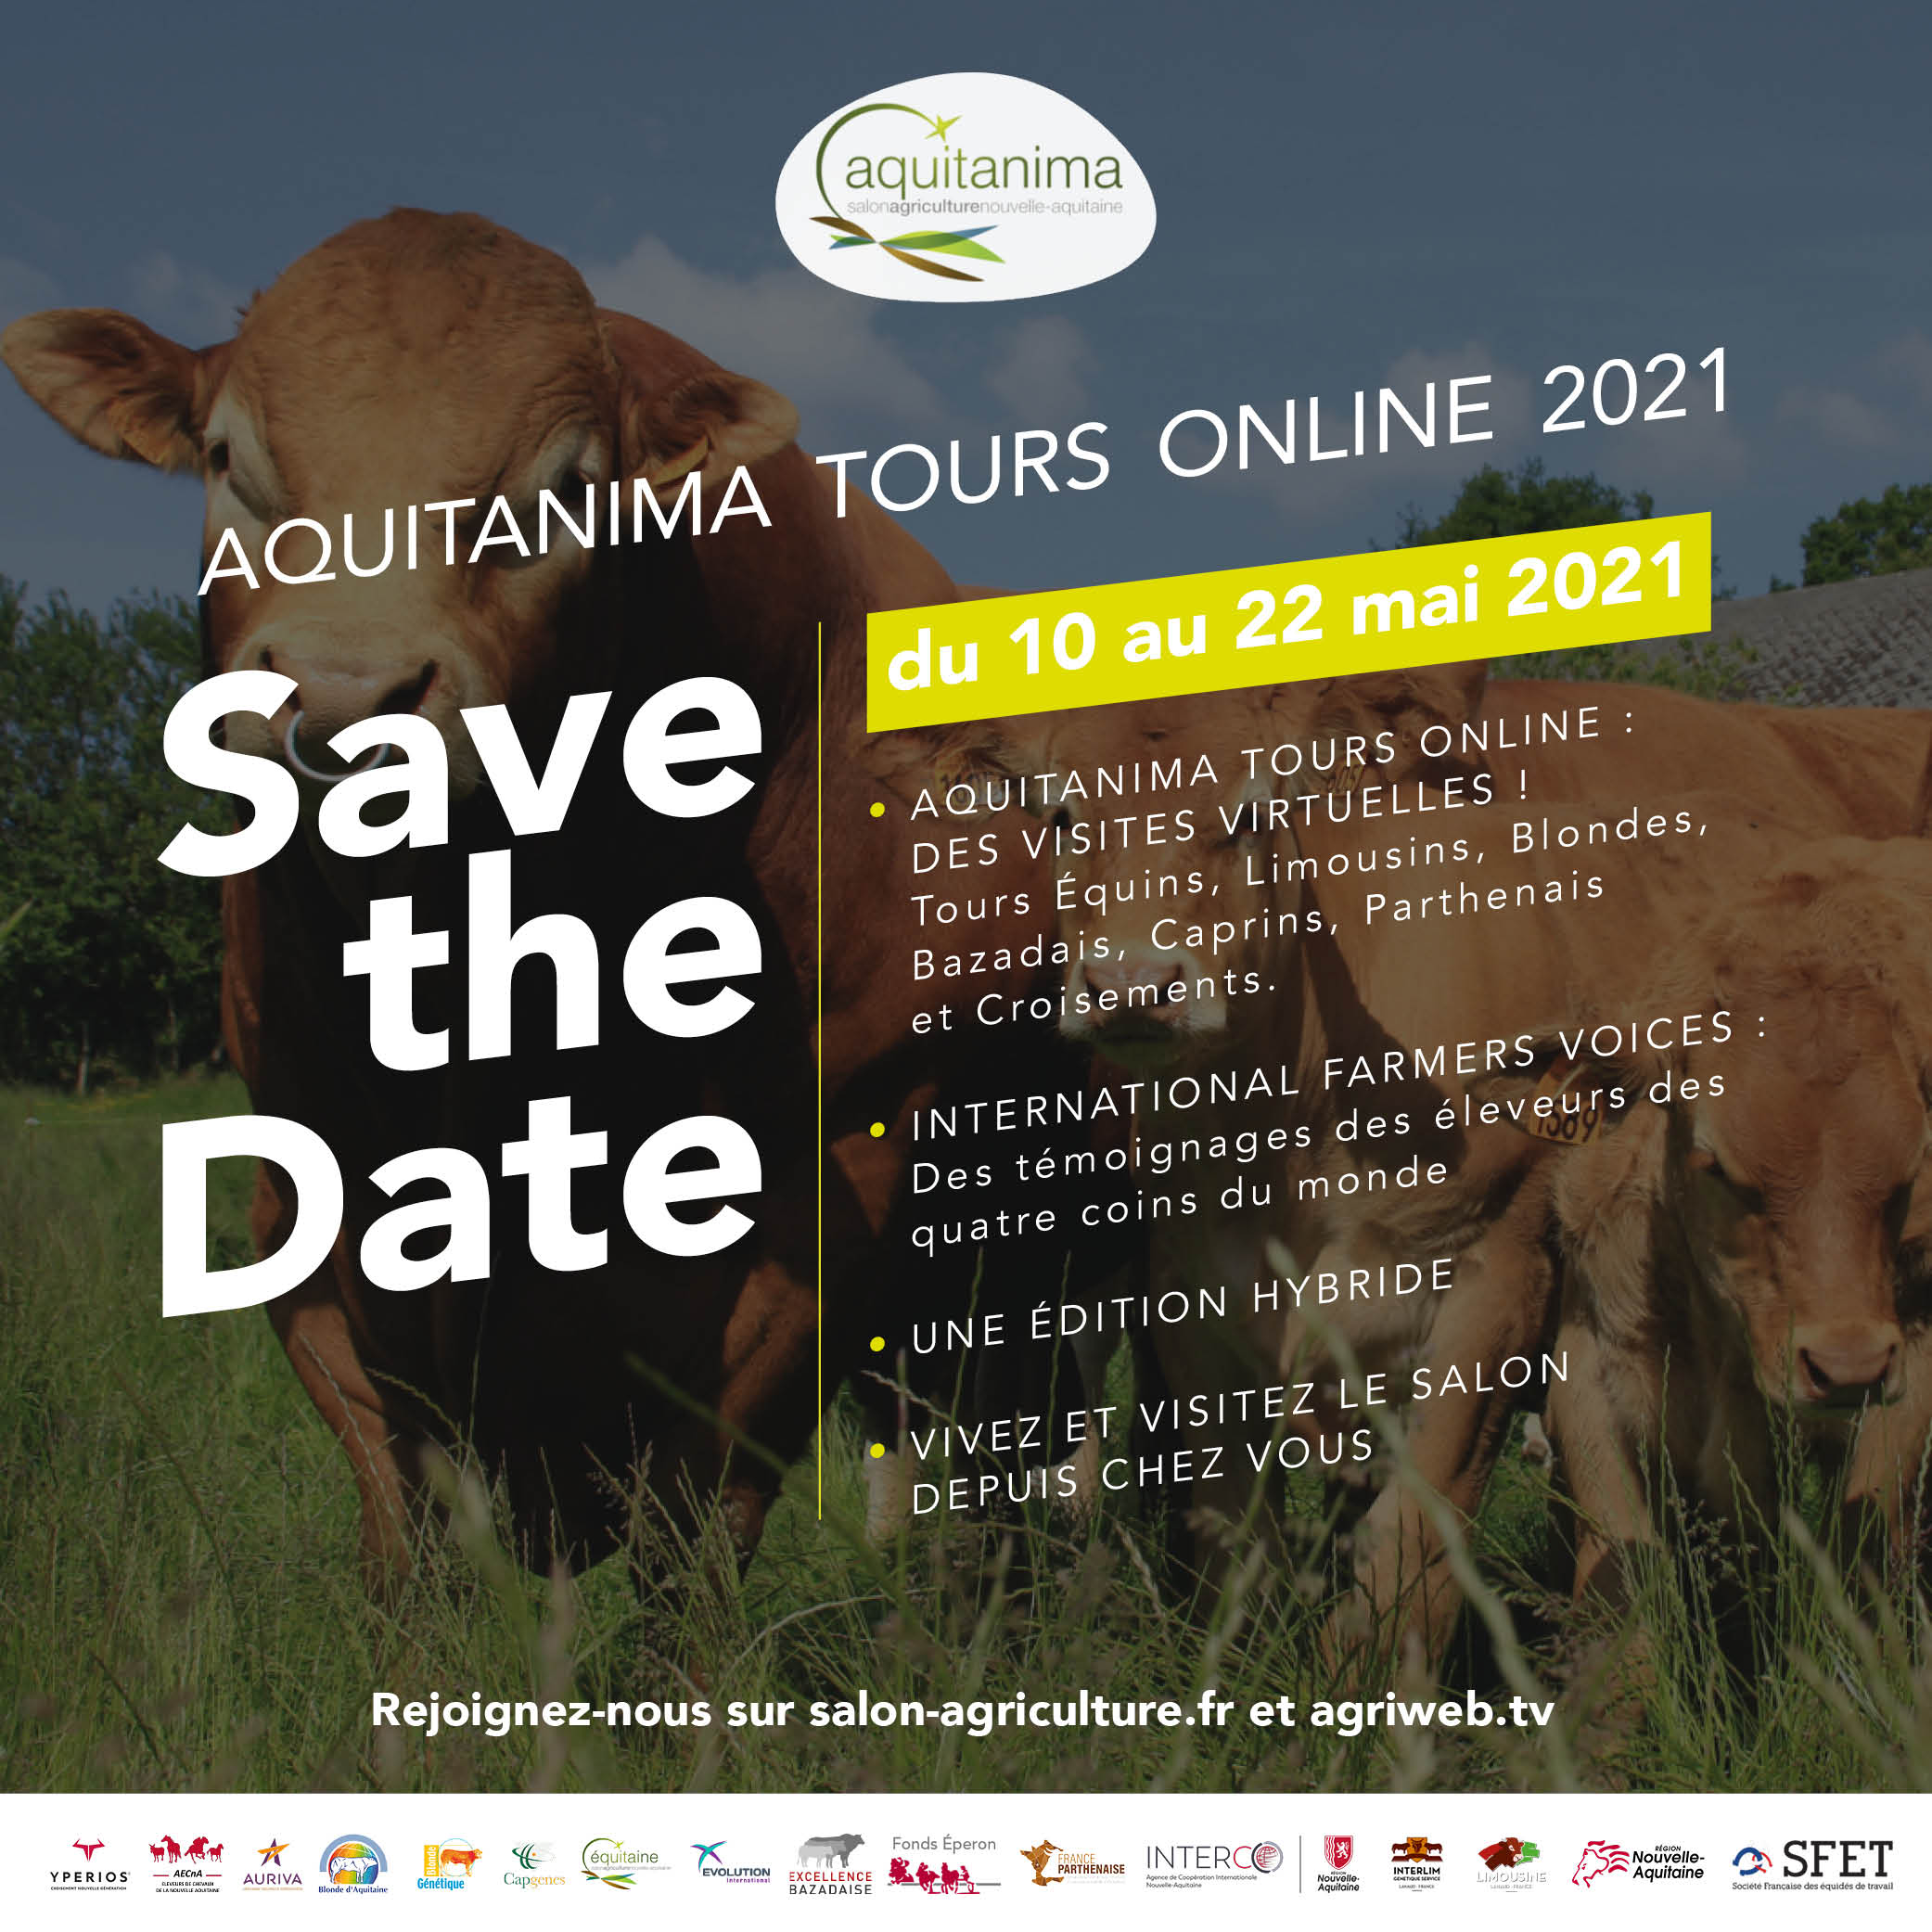 Programme: Aquitanima Tours Online 2021